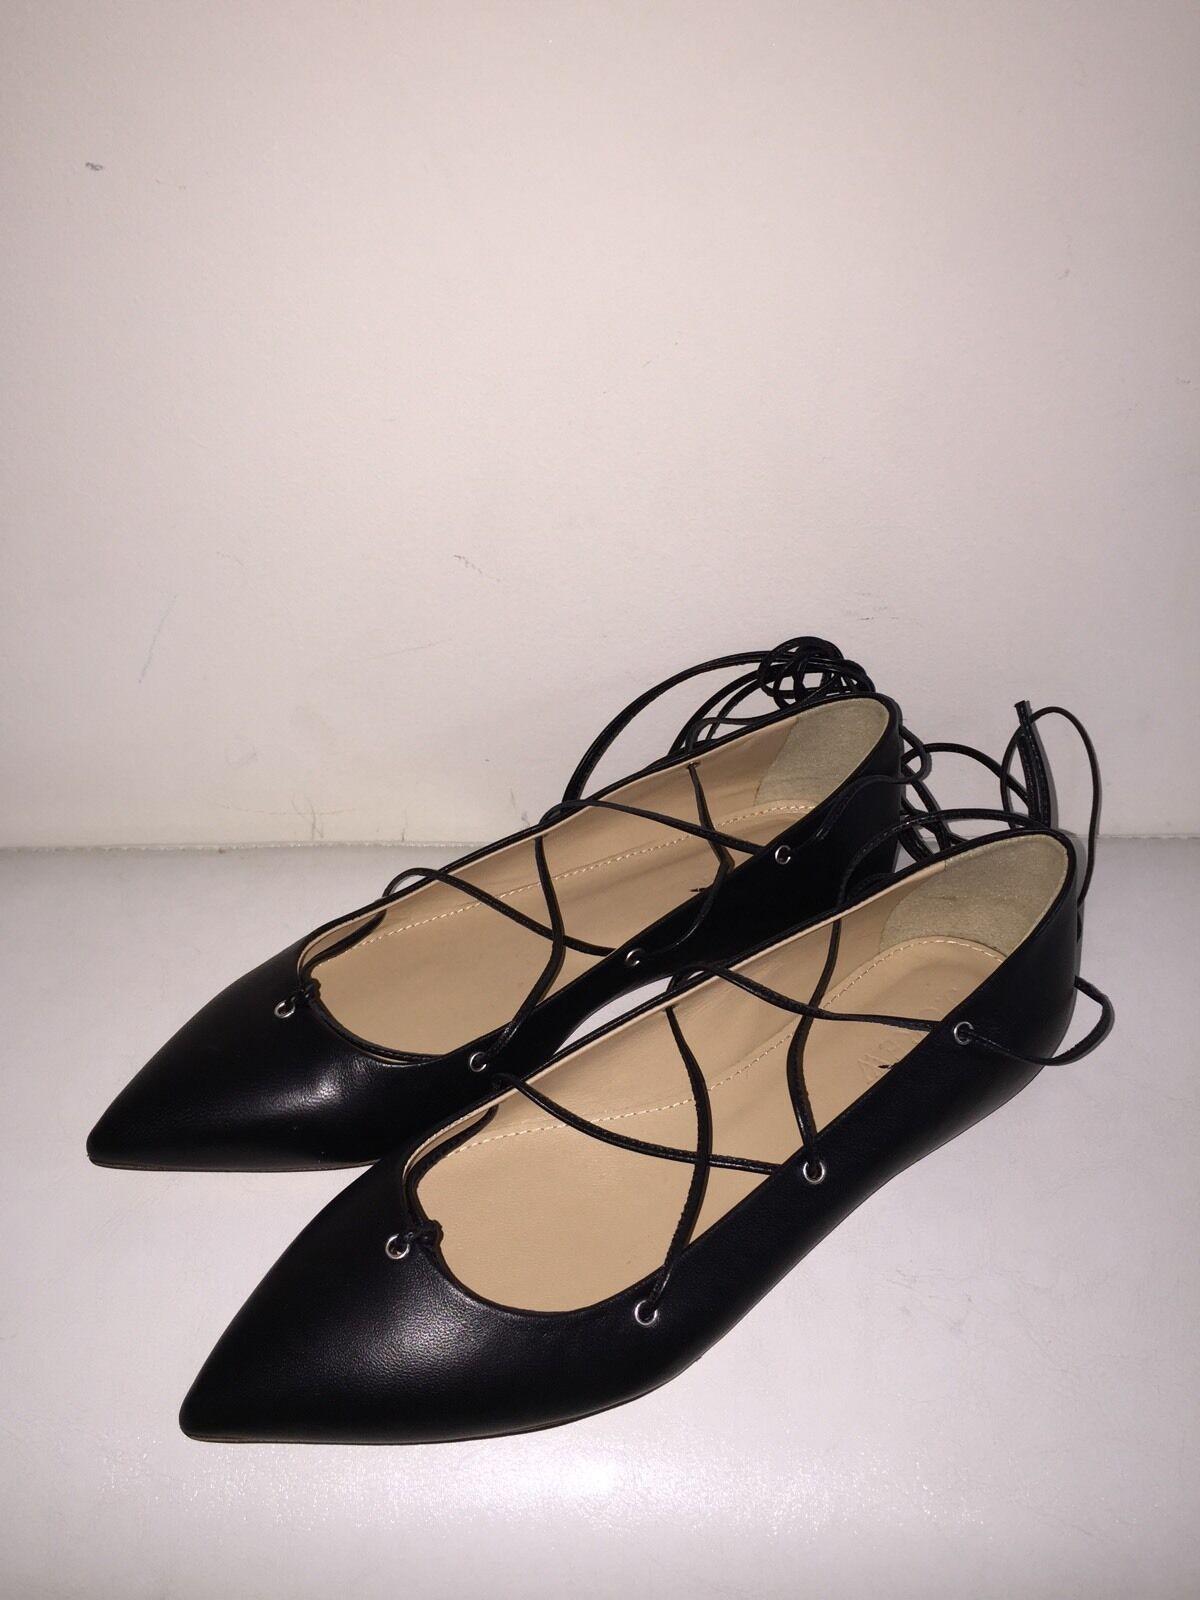 J CREW LEATHER LACE UP BALLET FLATS 158 Schuhe SZ-5.5 BLACK #F0281 NEU